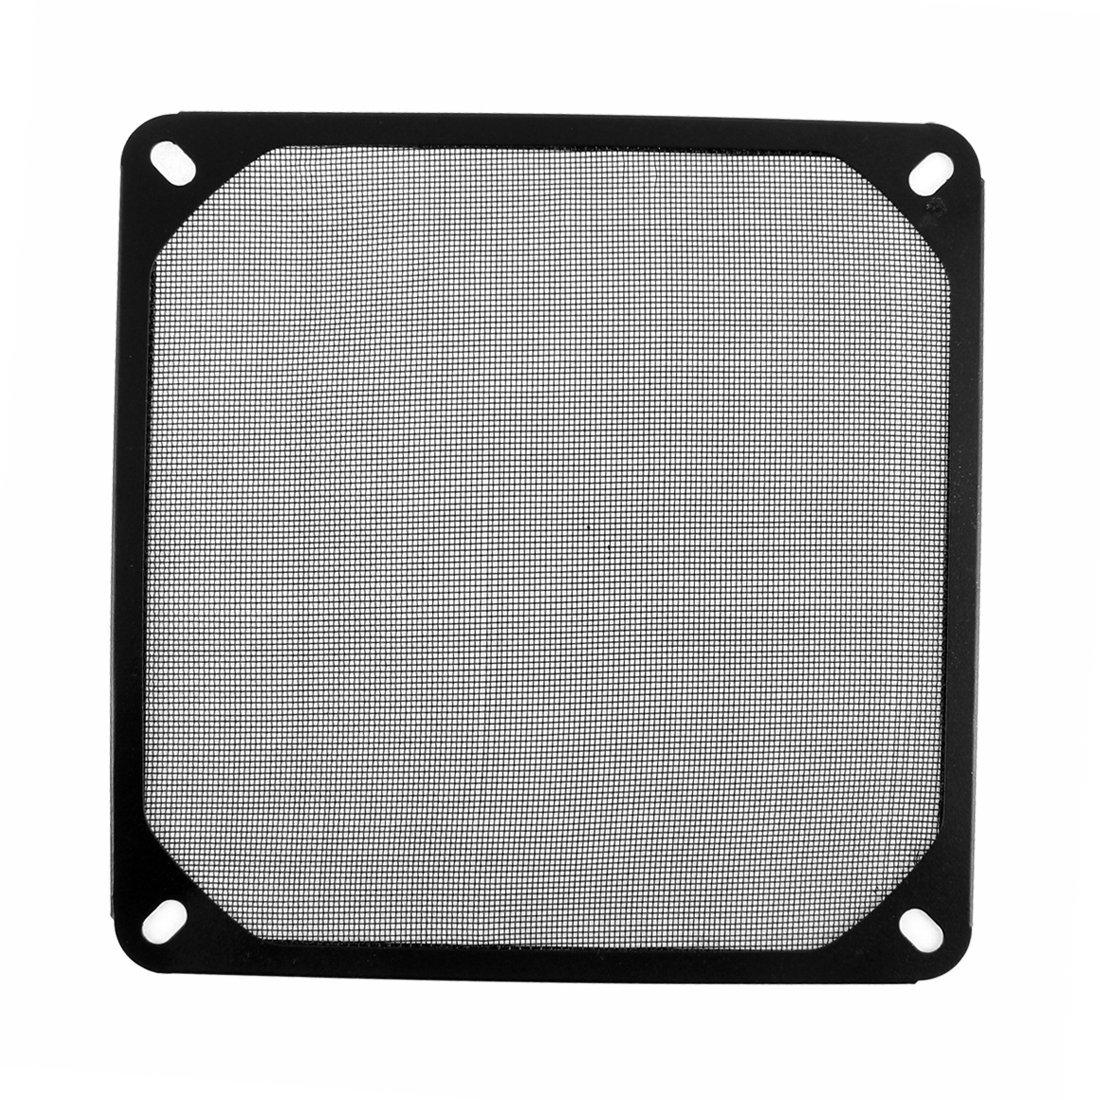 140mm x 140mm PC a prueba de polvo del ventilador del refrigerador cubierta de polvo filtro de malla Negro DealMux DLM-B01A8L8P84